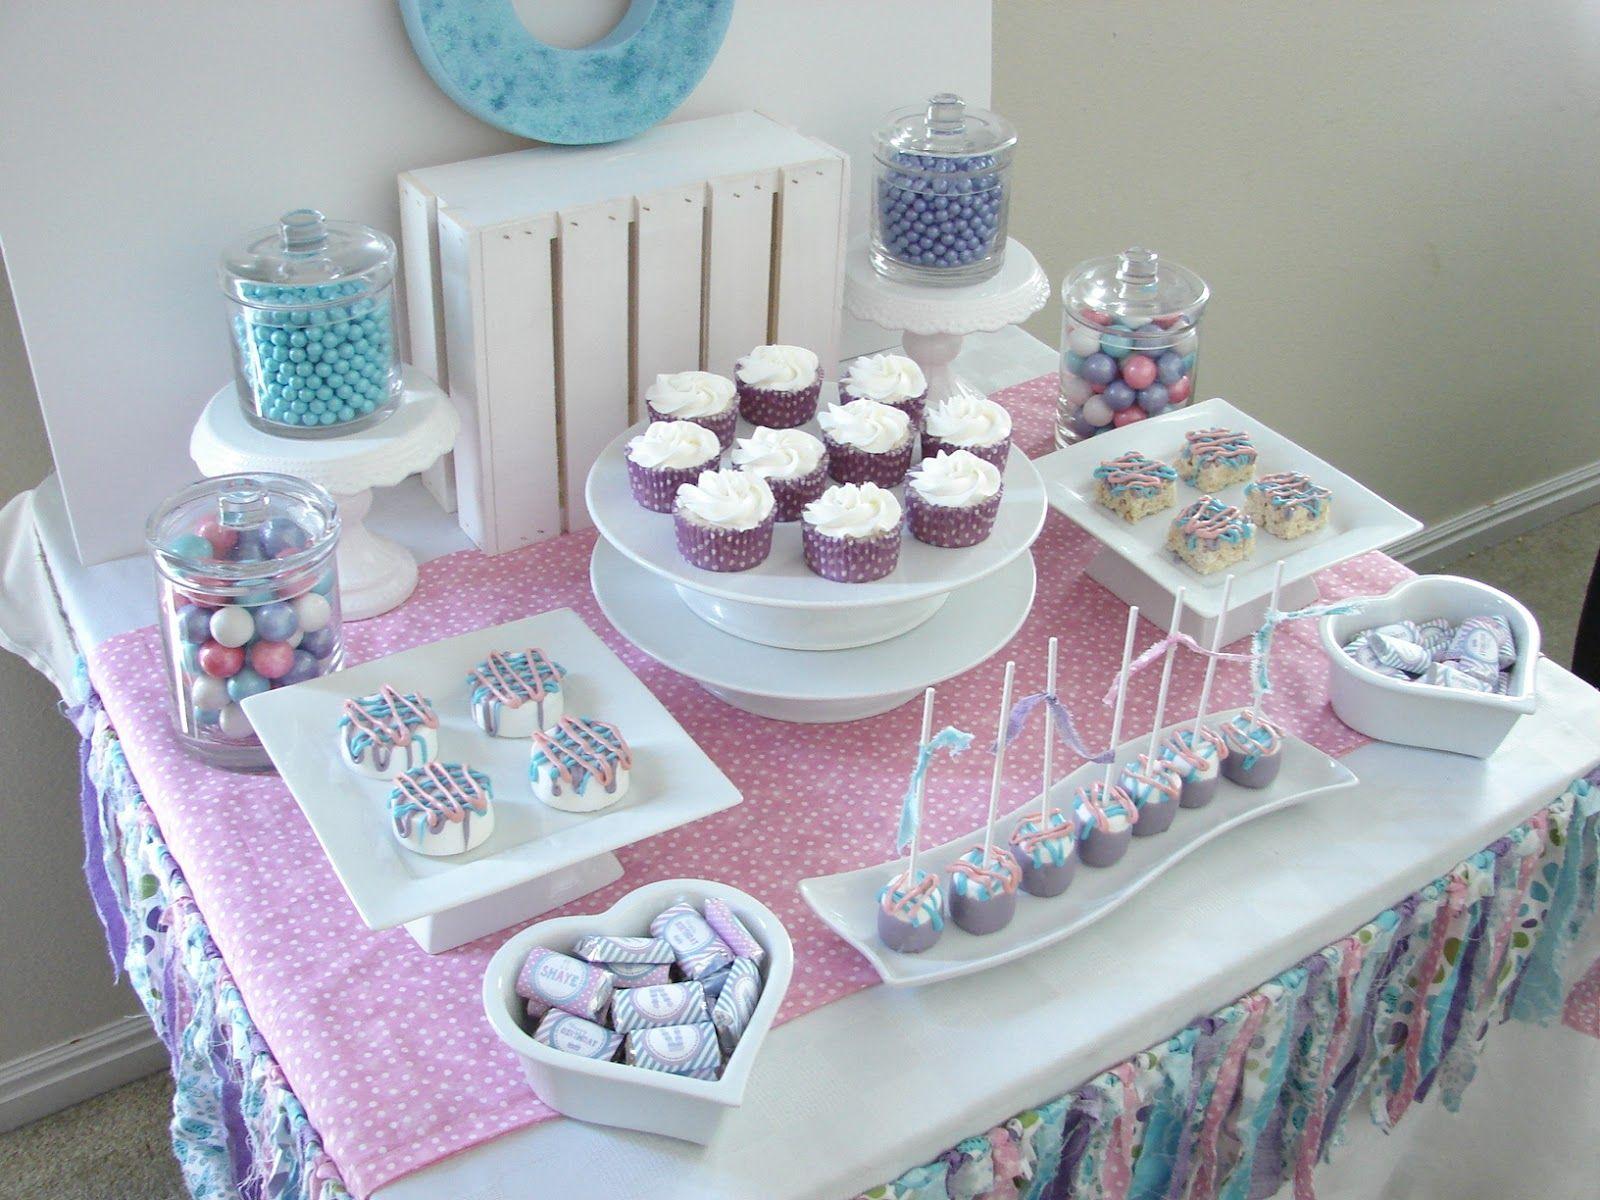 No Yeast Cinnamon Rolls Dessert Table Birthday Small Birthday Parties Pajama Birthday Parties